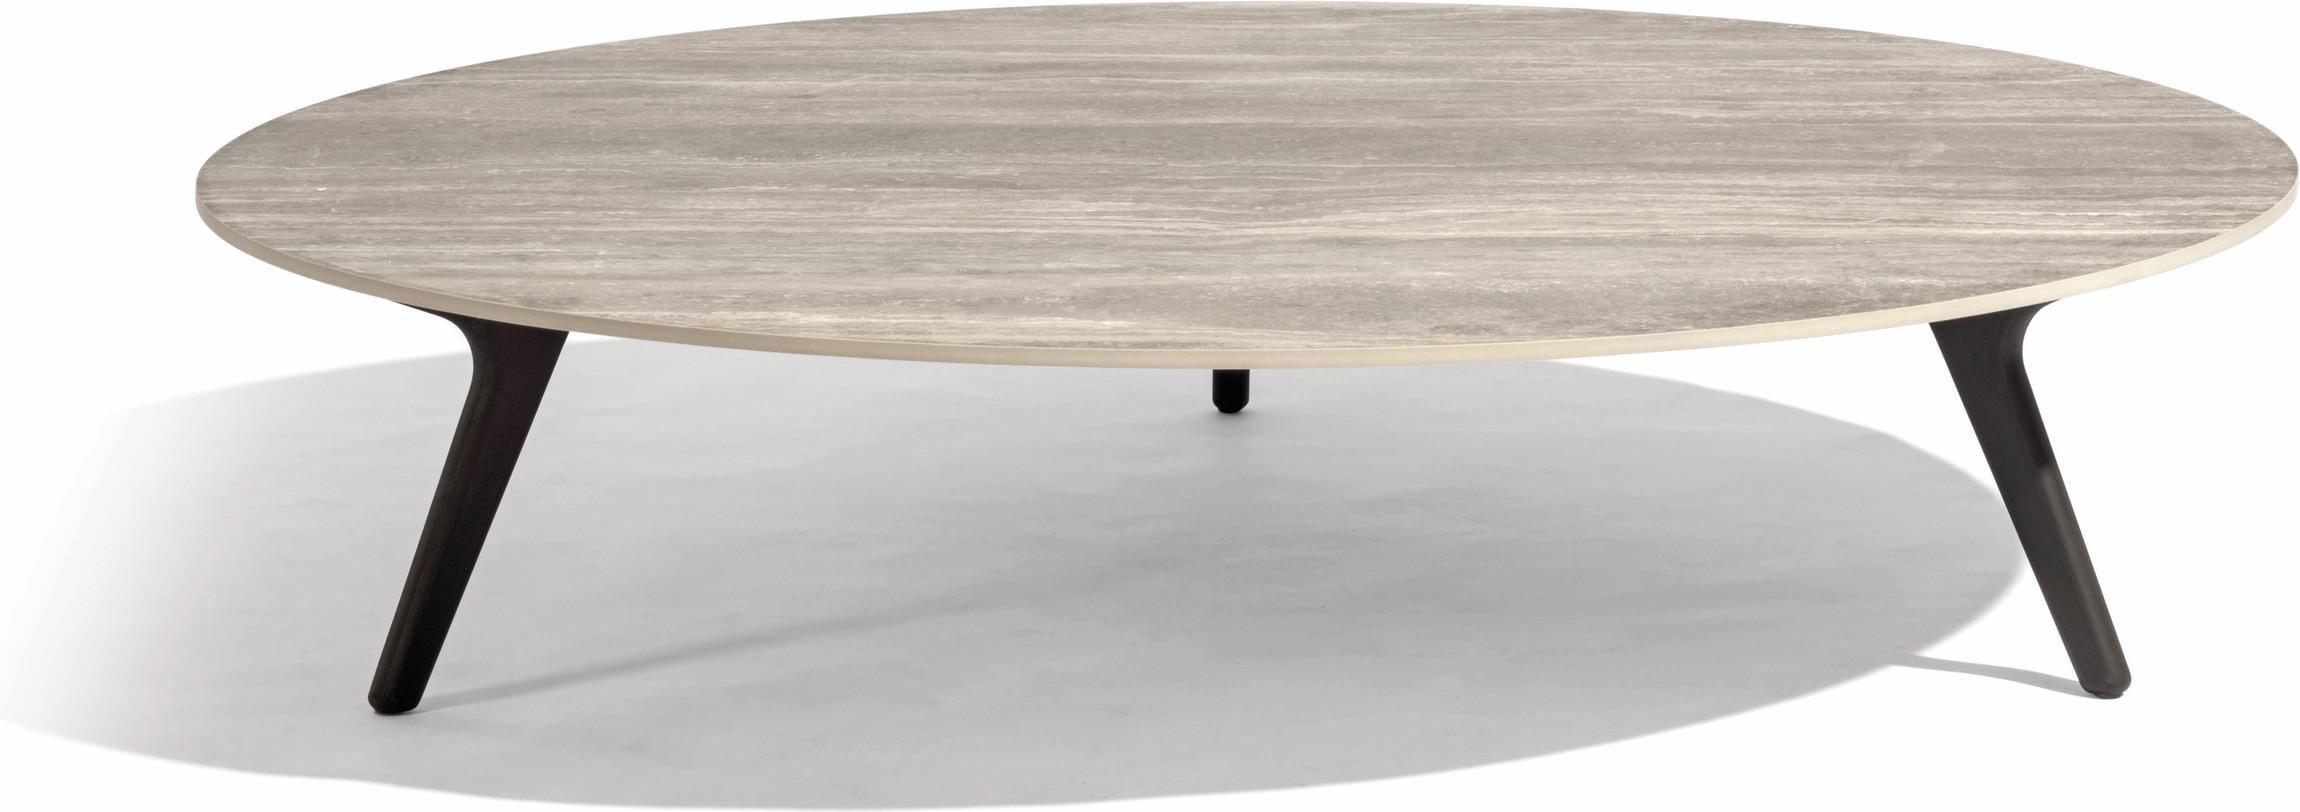 Torsa Low table - Teak nero - CT 148